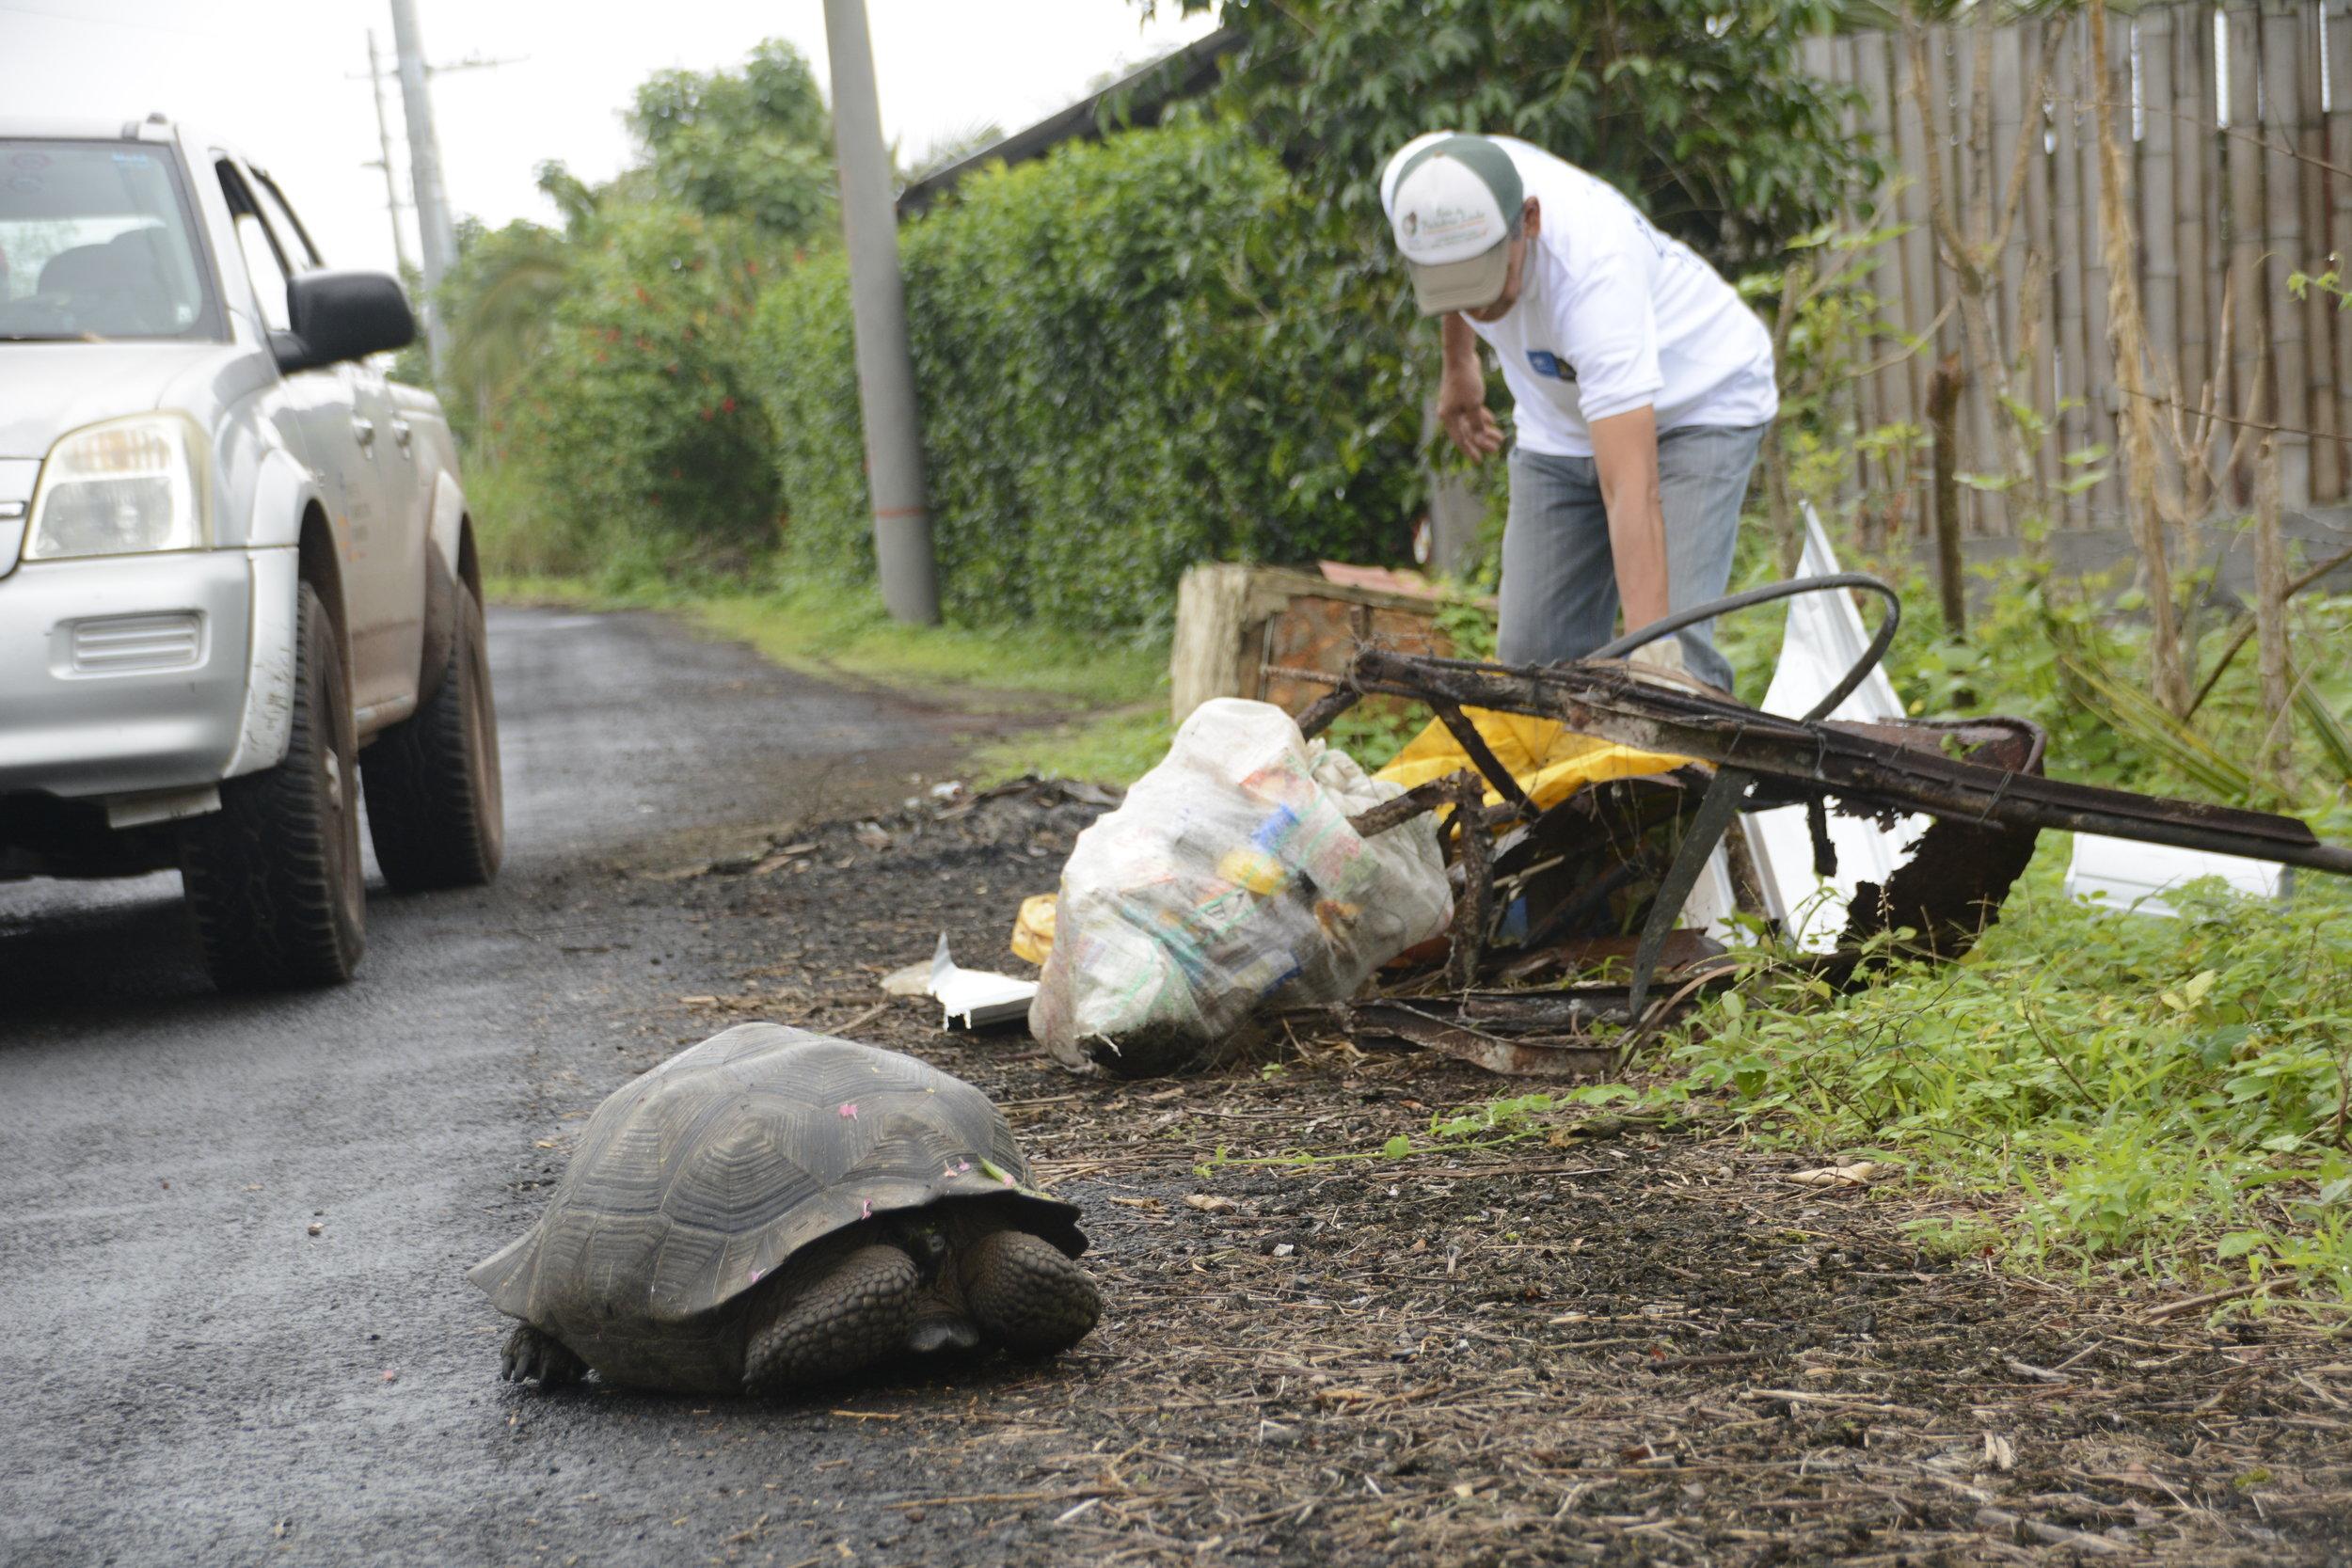 Figure 1 . Waste collection in a rural area. Photo: Carolina Peñafiel